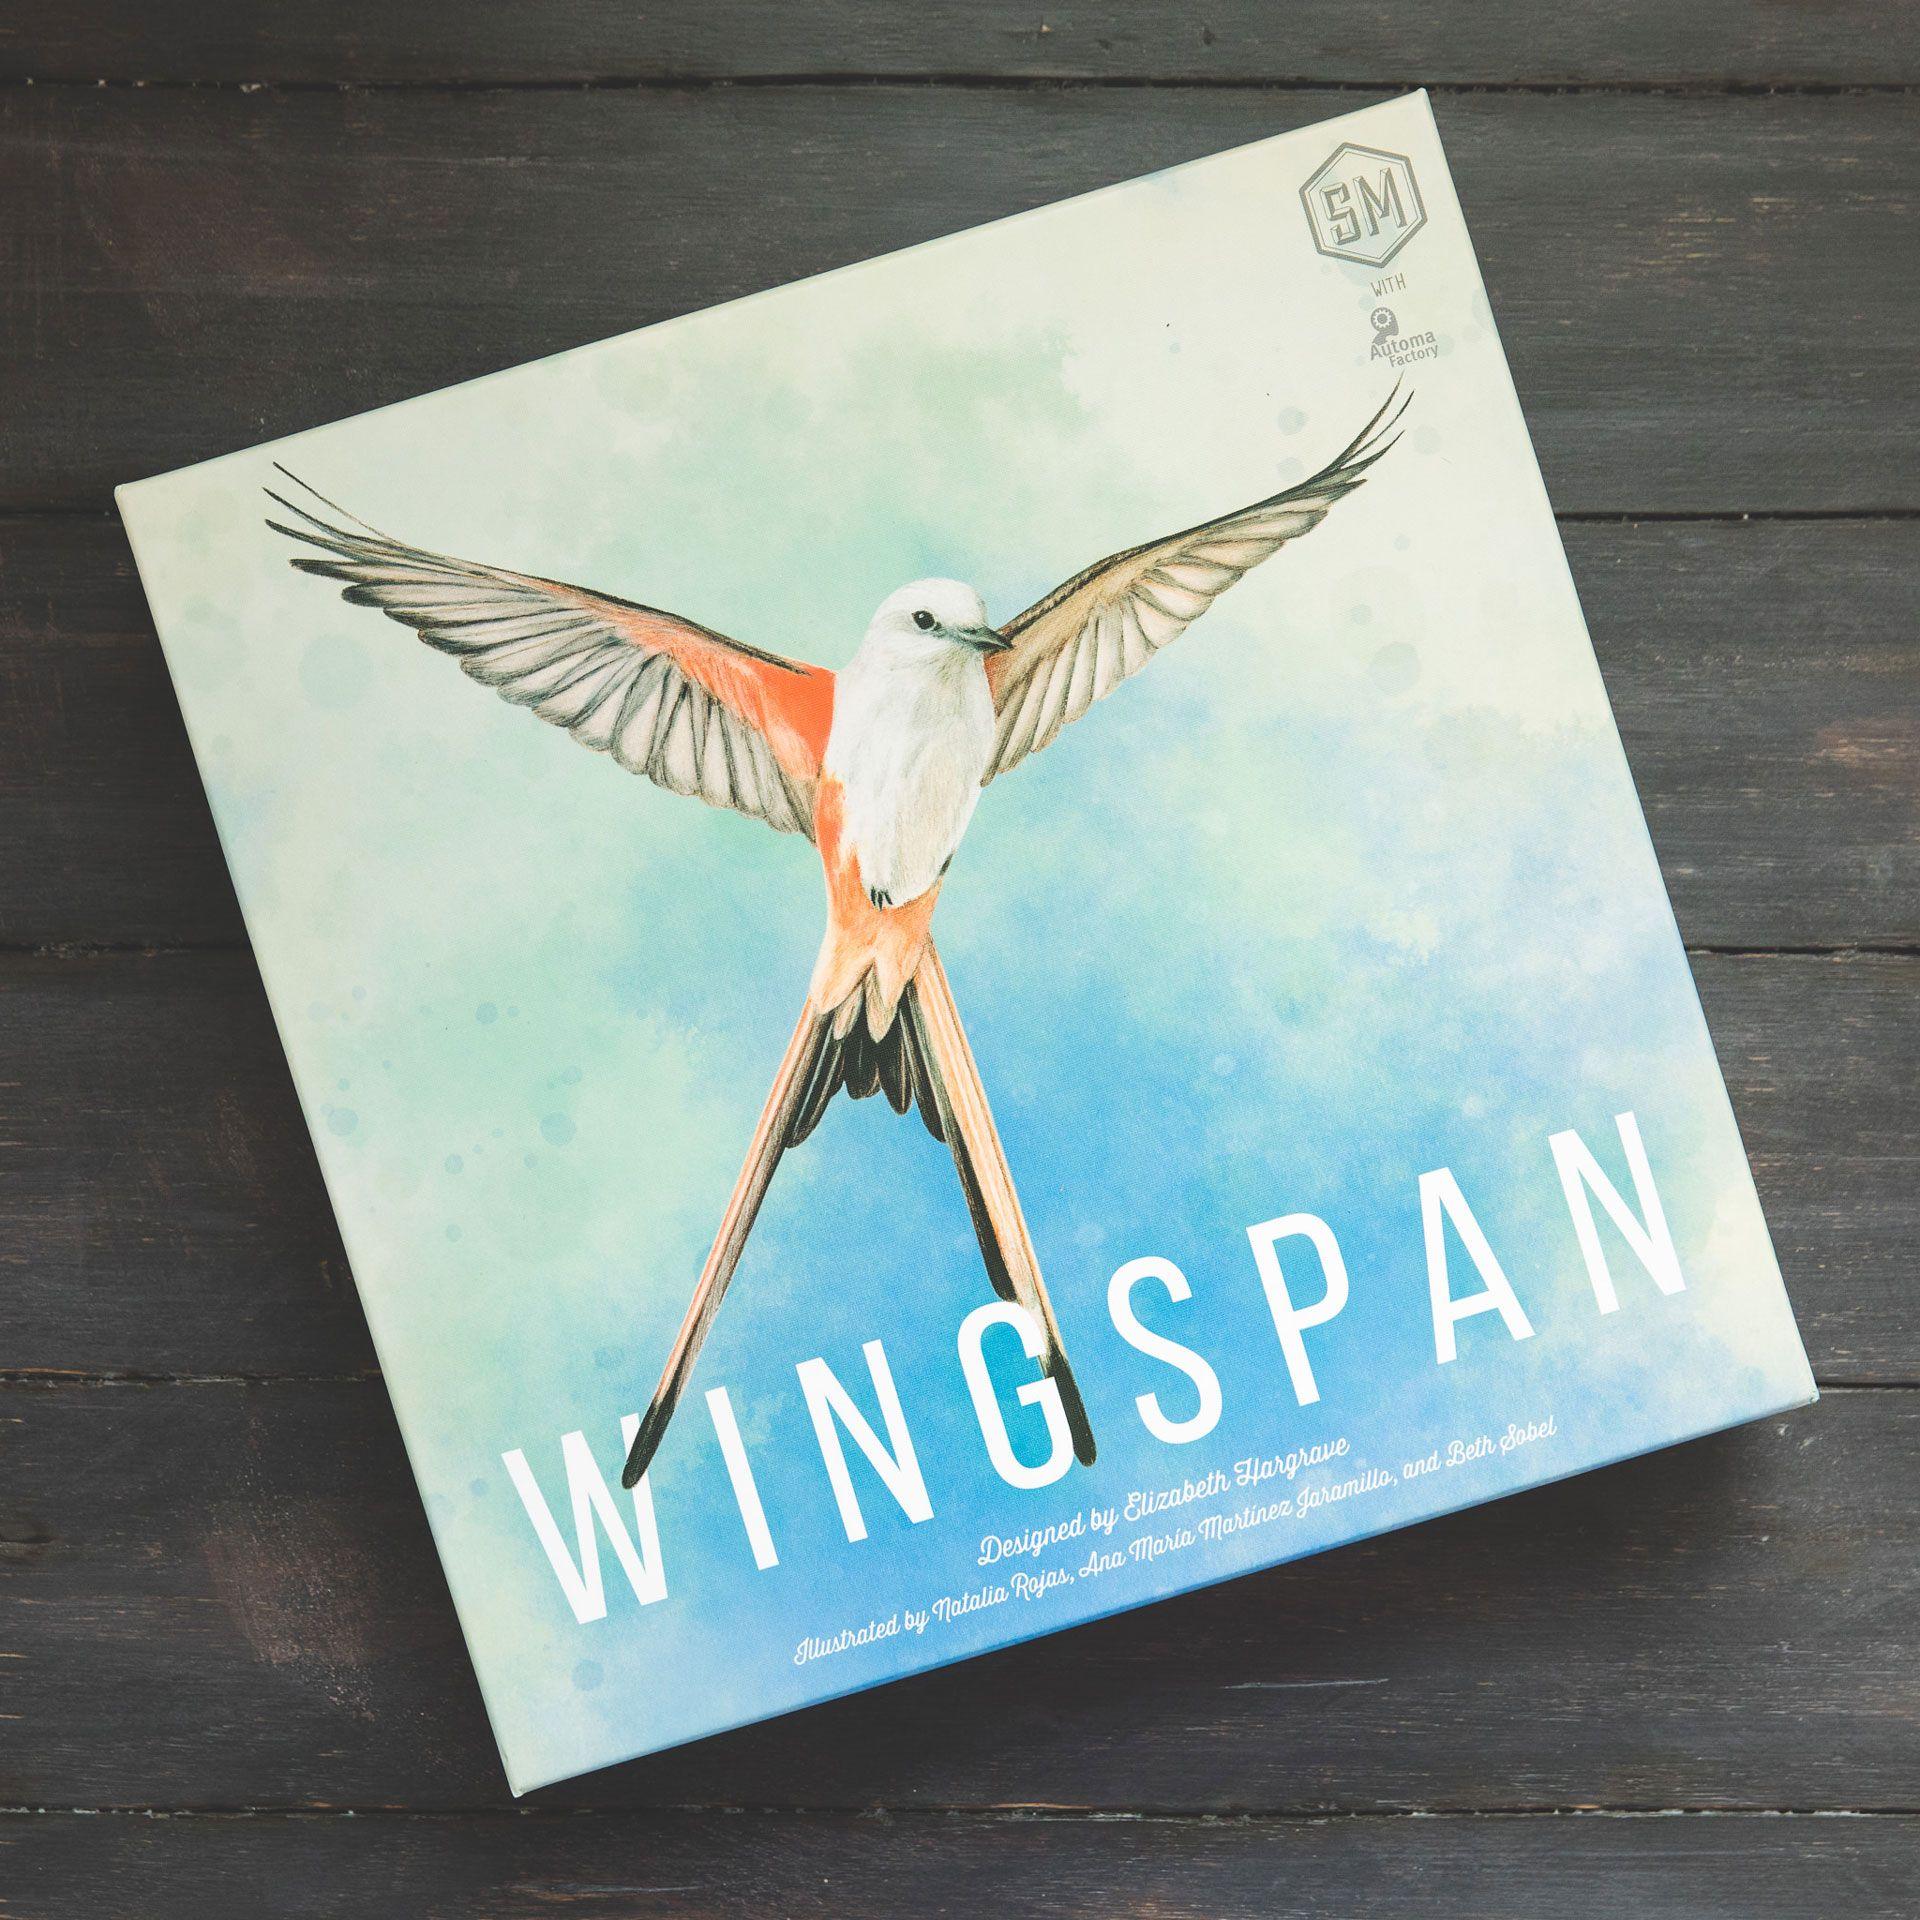 Wingspan board game box inspiration of photographer Alexi Hobbs